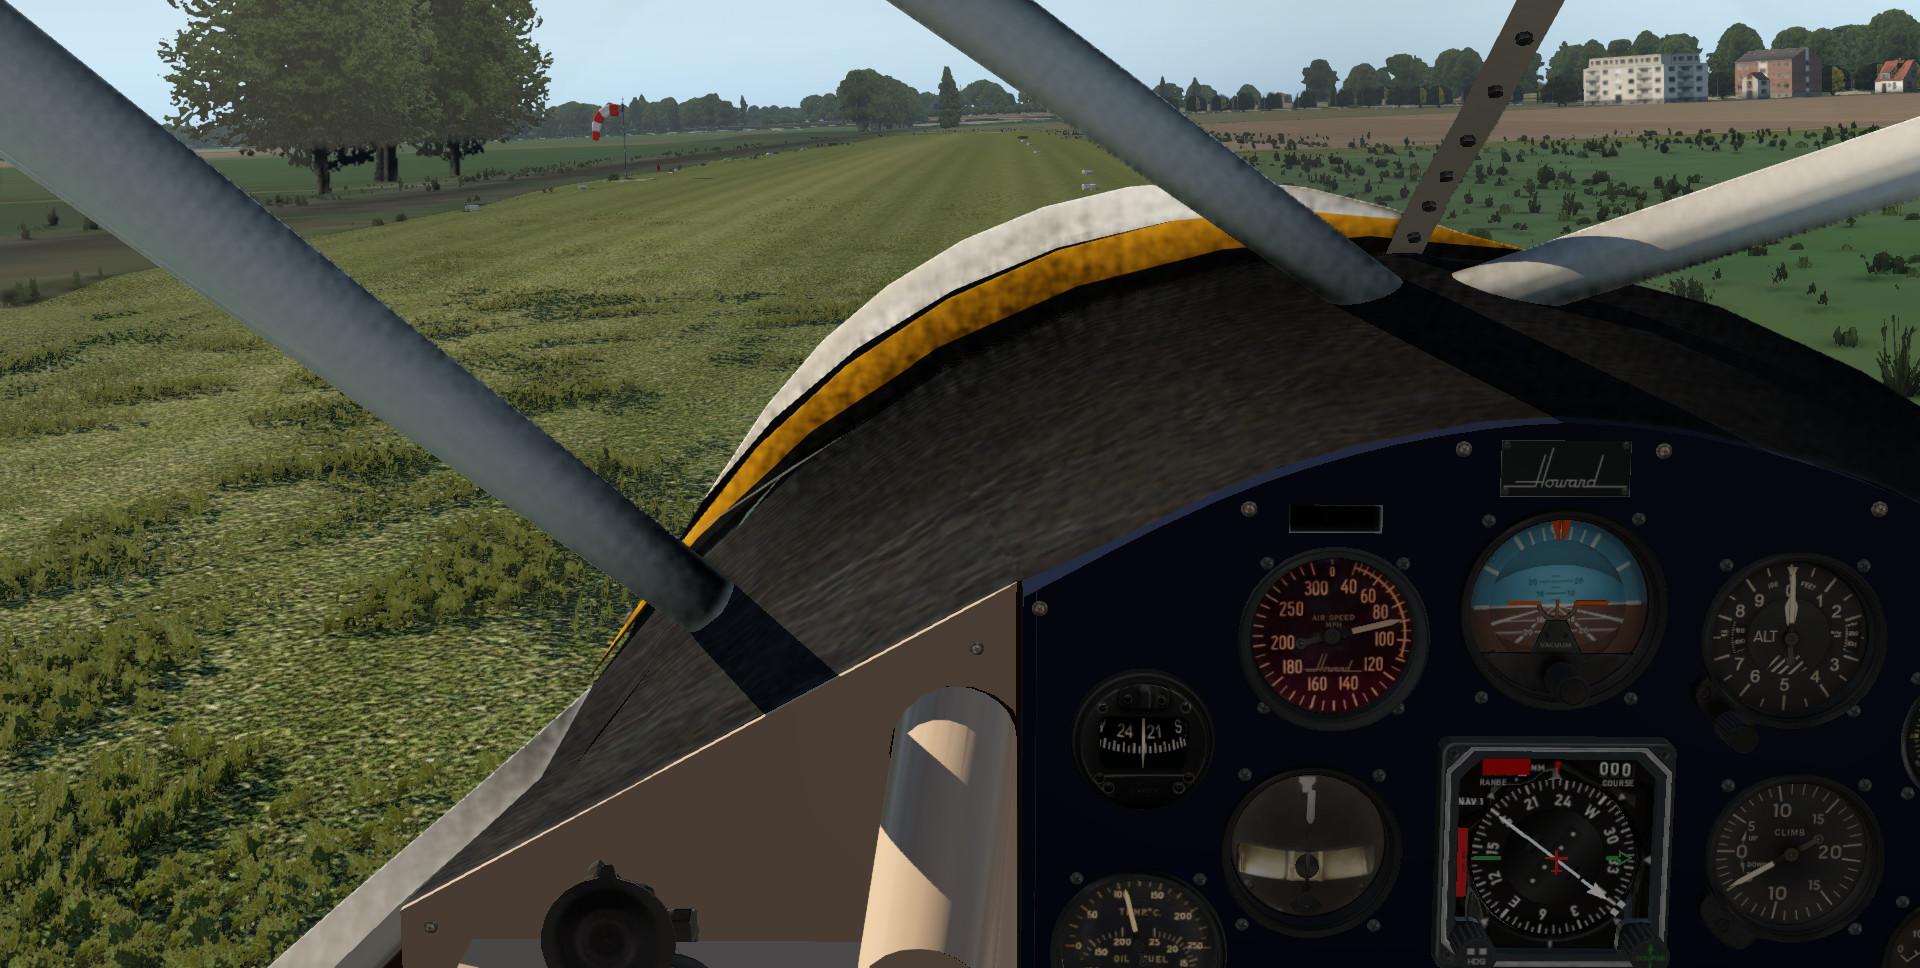 nordseerundflug-046t0ki3.jpg